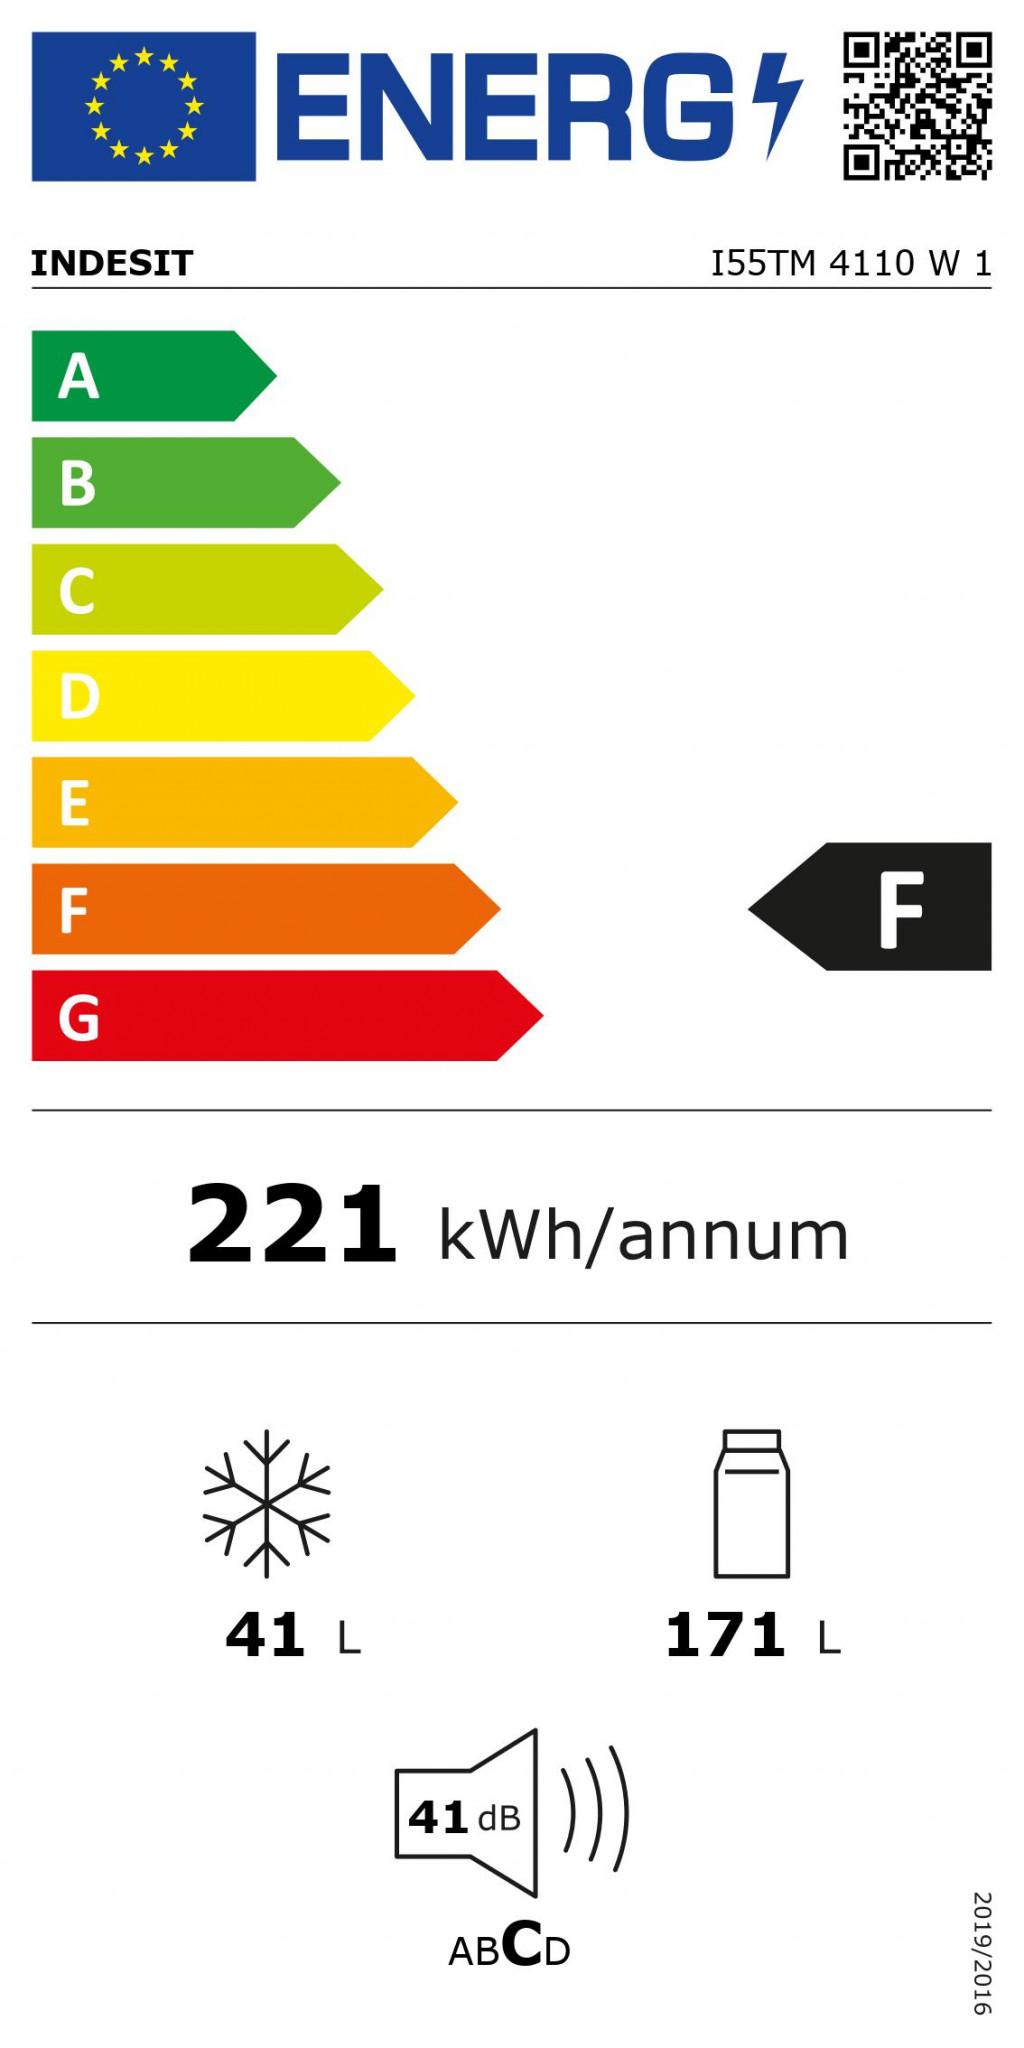 INDESIT Refrigerator I55TM 4110 W 1 Energy efficiency class F, Free standing,  Double Door, Height 144 cm, Fridge net capacity 171 L, Freezer net capacity 41 L, 41 dB, White